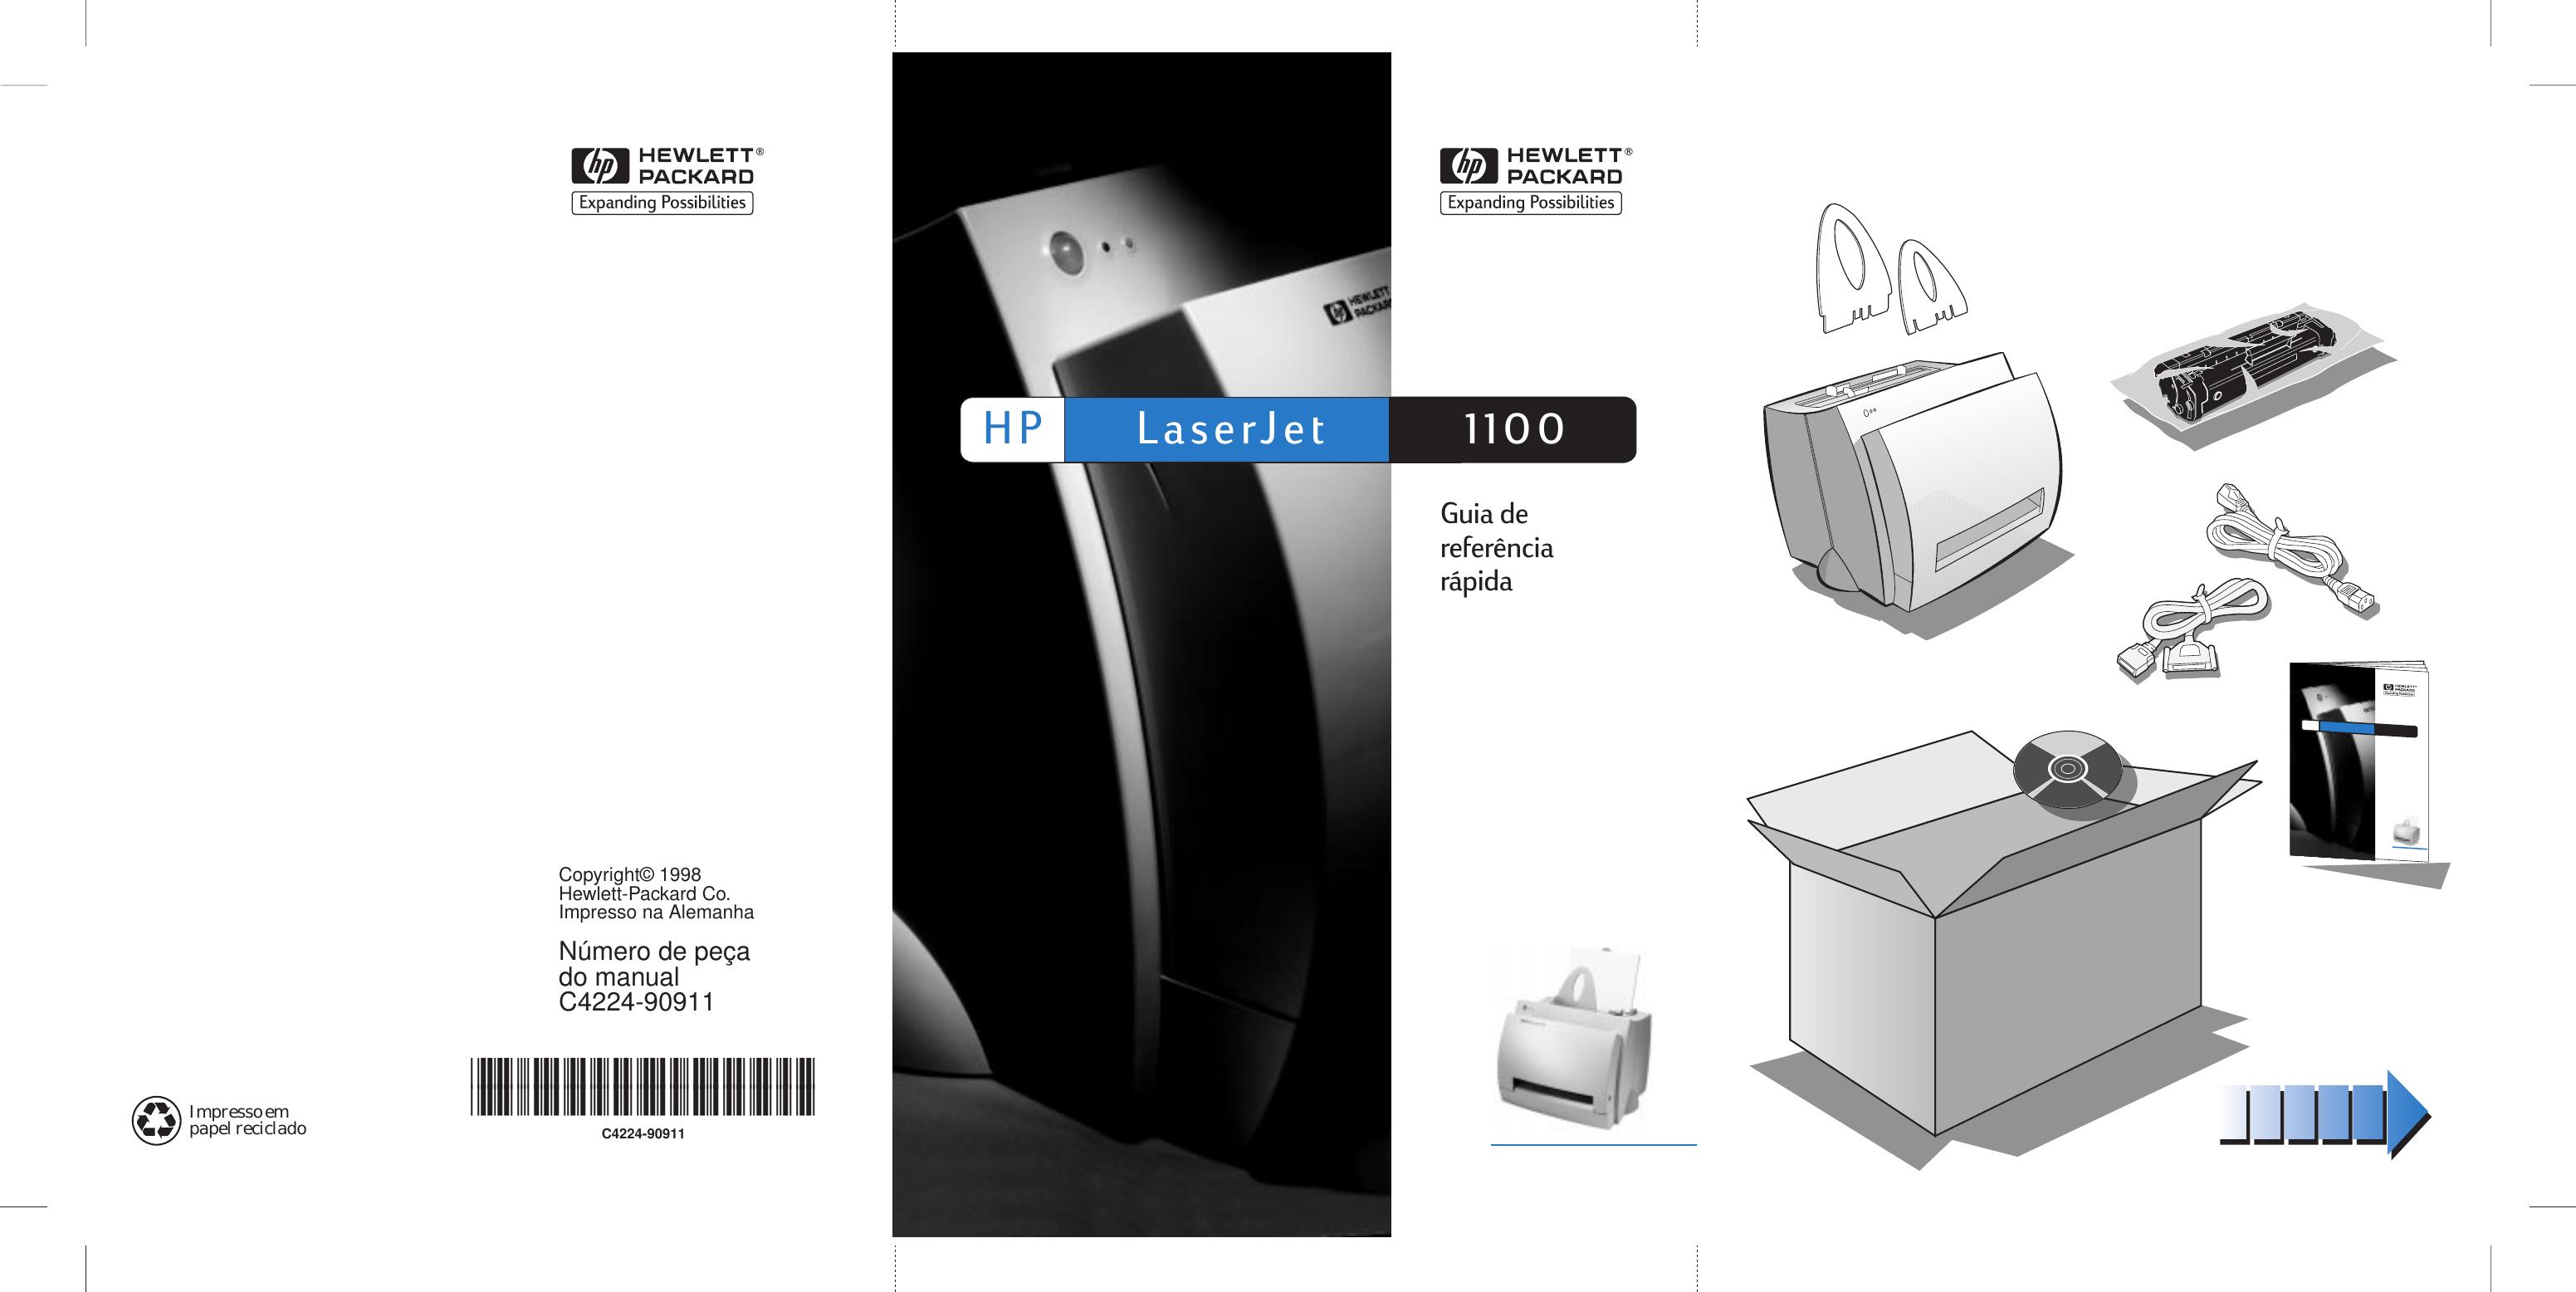 hewlett packard laserjet 1100 manual expert user guide u2022 rh manualguidestudio today HP LaserJet 1100 Printer Drivers HP 1100 Drivers